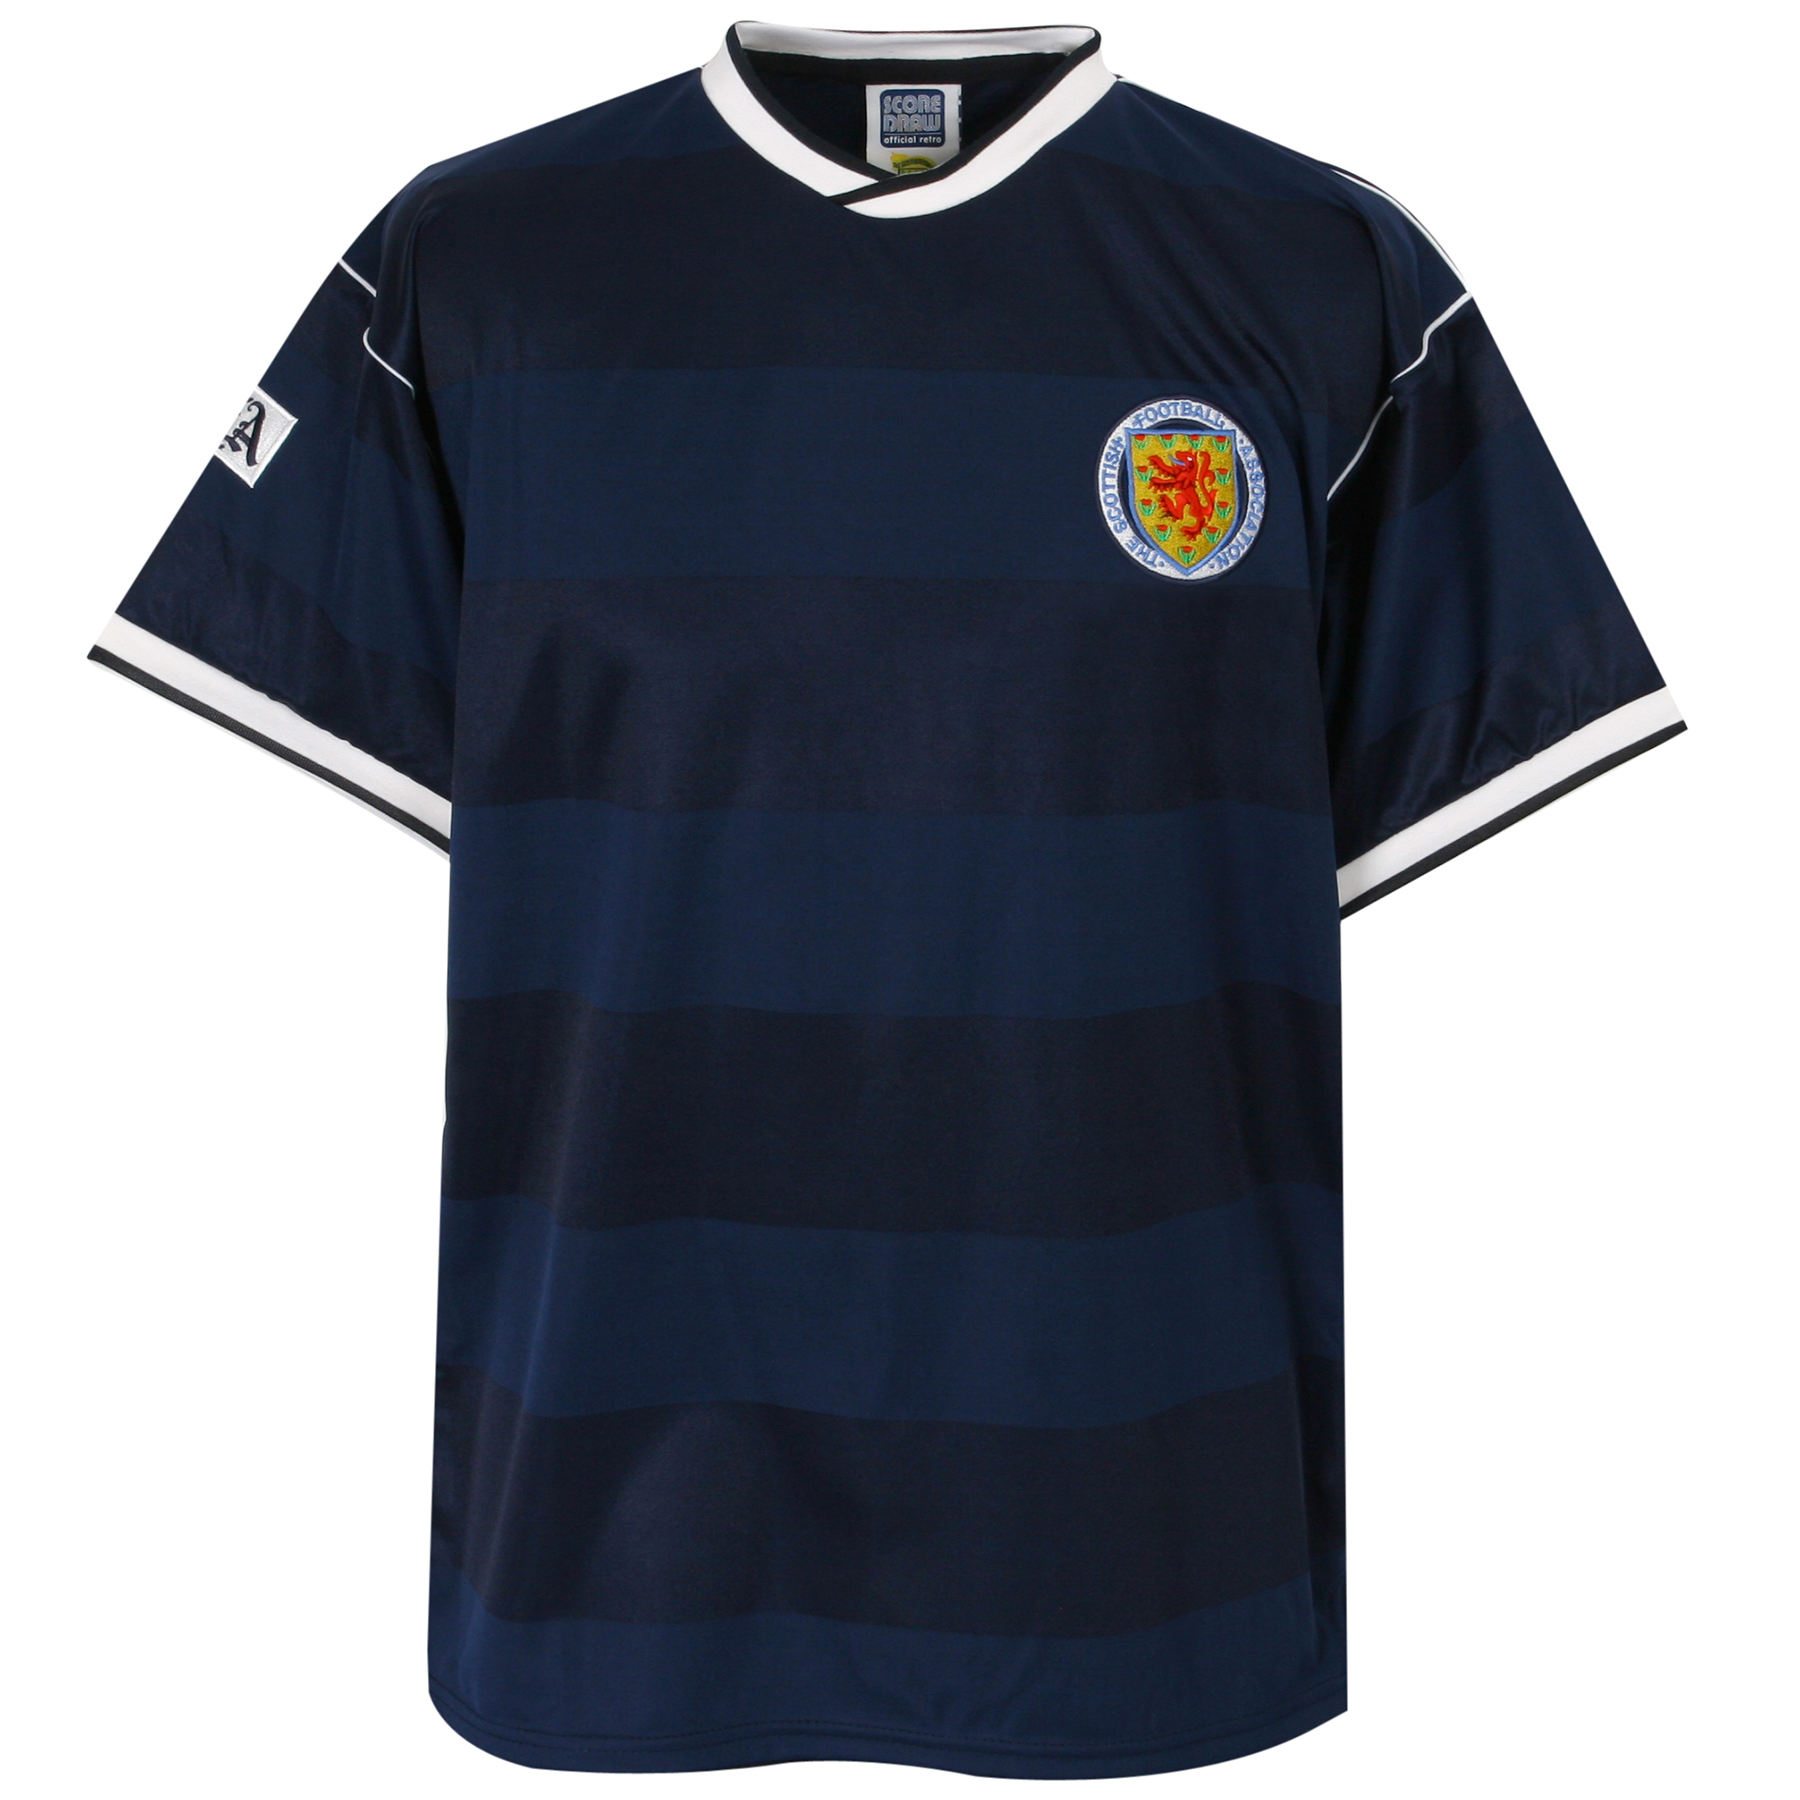 Scotland 1986 World Cup Retro Shirt